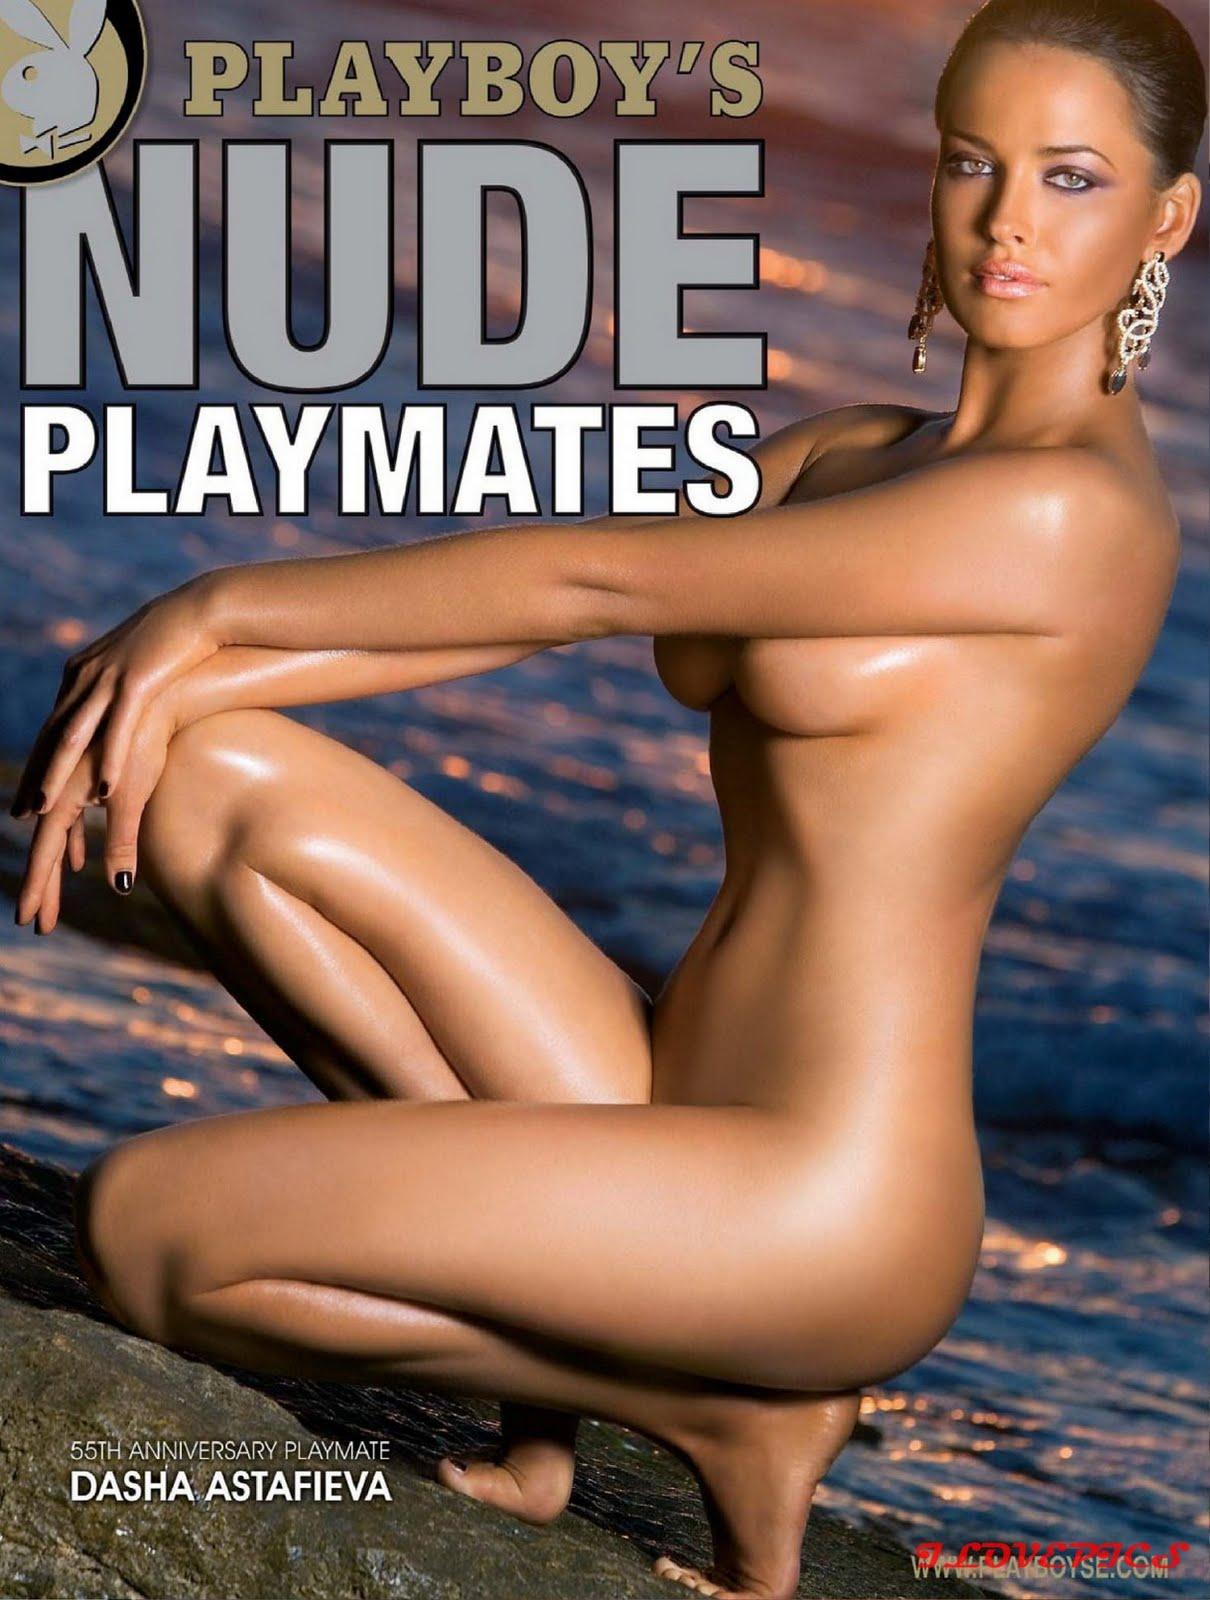 http://2.bp.blogspot.com/-O4rDRAvLq4A/Tsv7DM_oufI/AAAAAAAACUg/-GJ2_r9k36M/s1600/SE+Playboy+Nude+Playmates+2011-1+Ilovepics.jpg